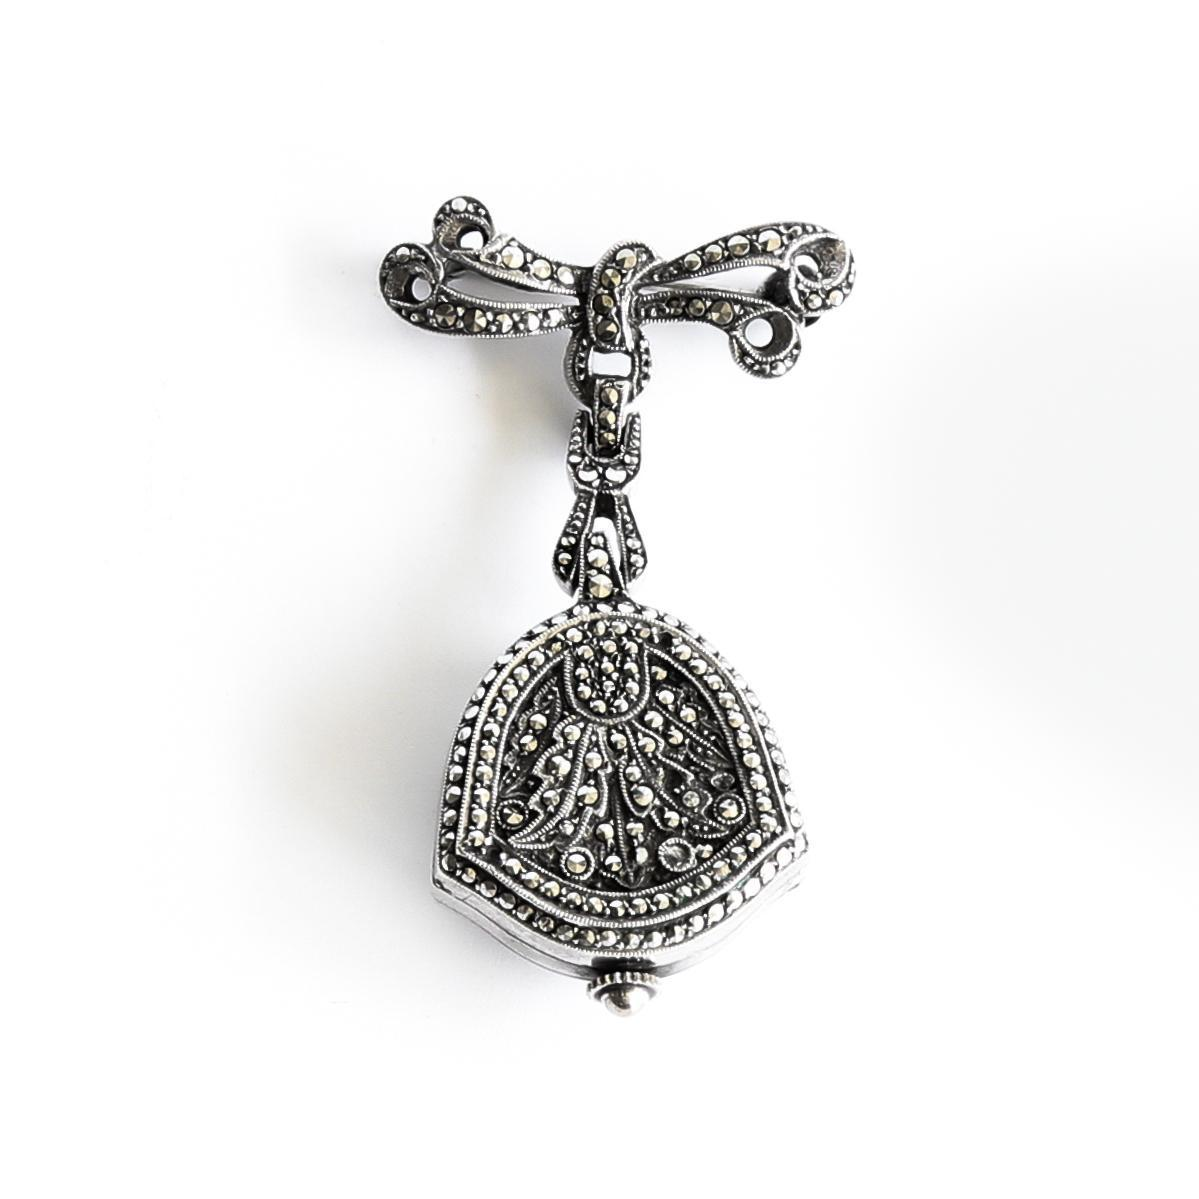 Lady's Bucherer Vintage 800 Silver Marquesite Lapel Watch